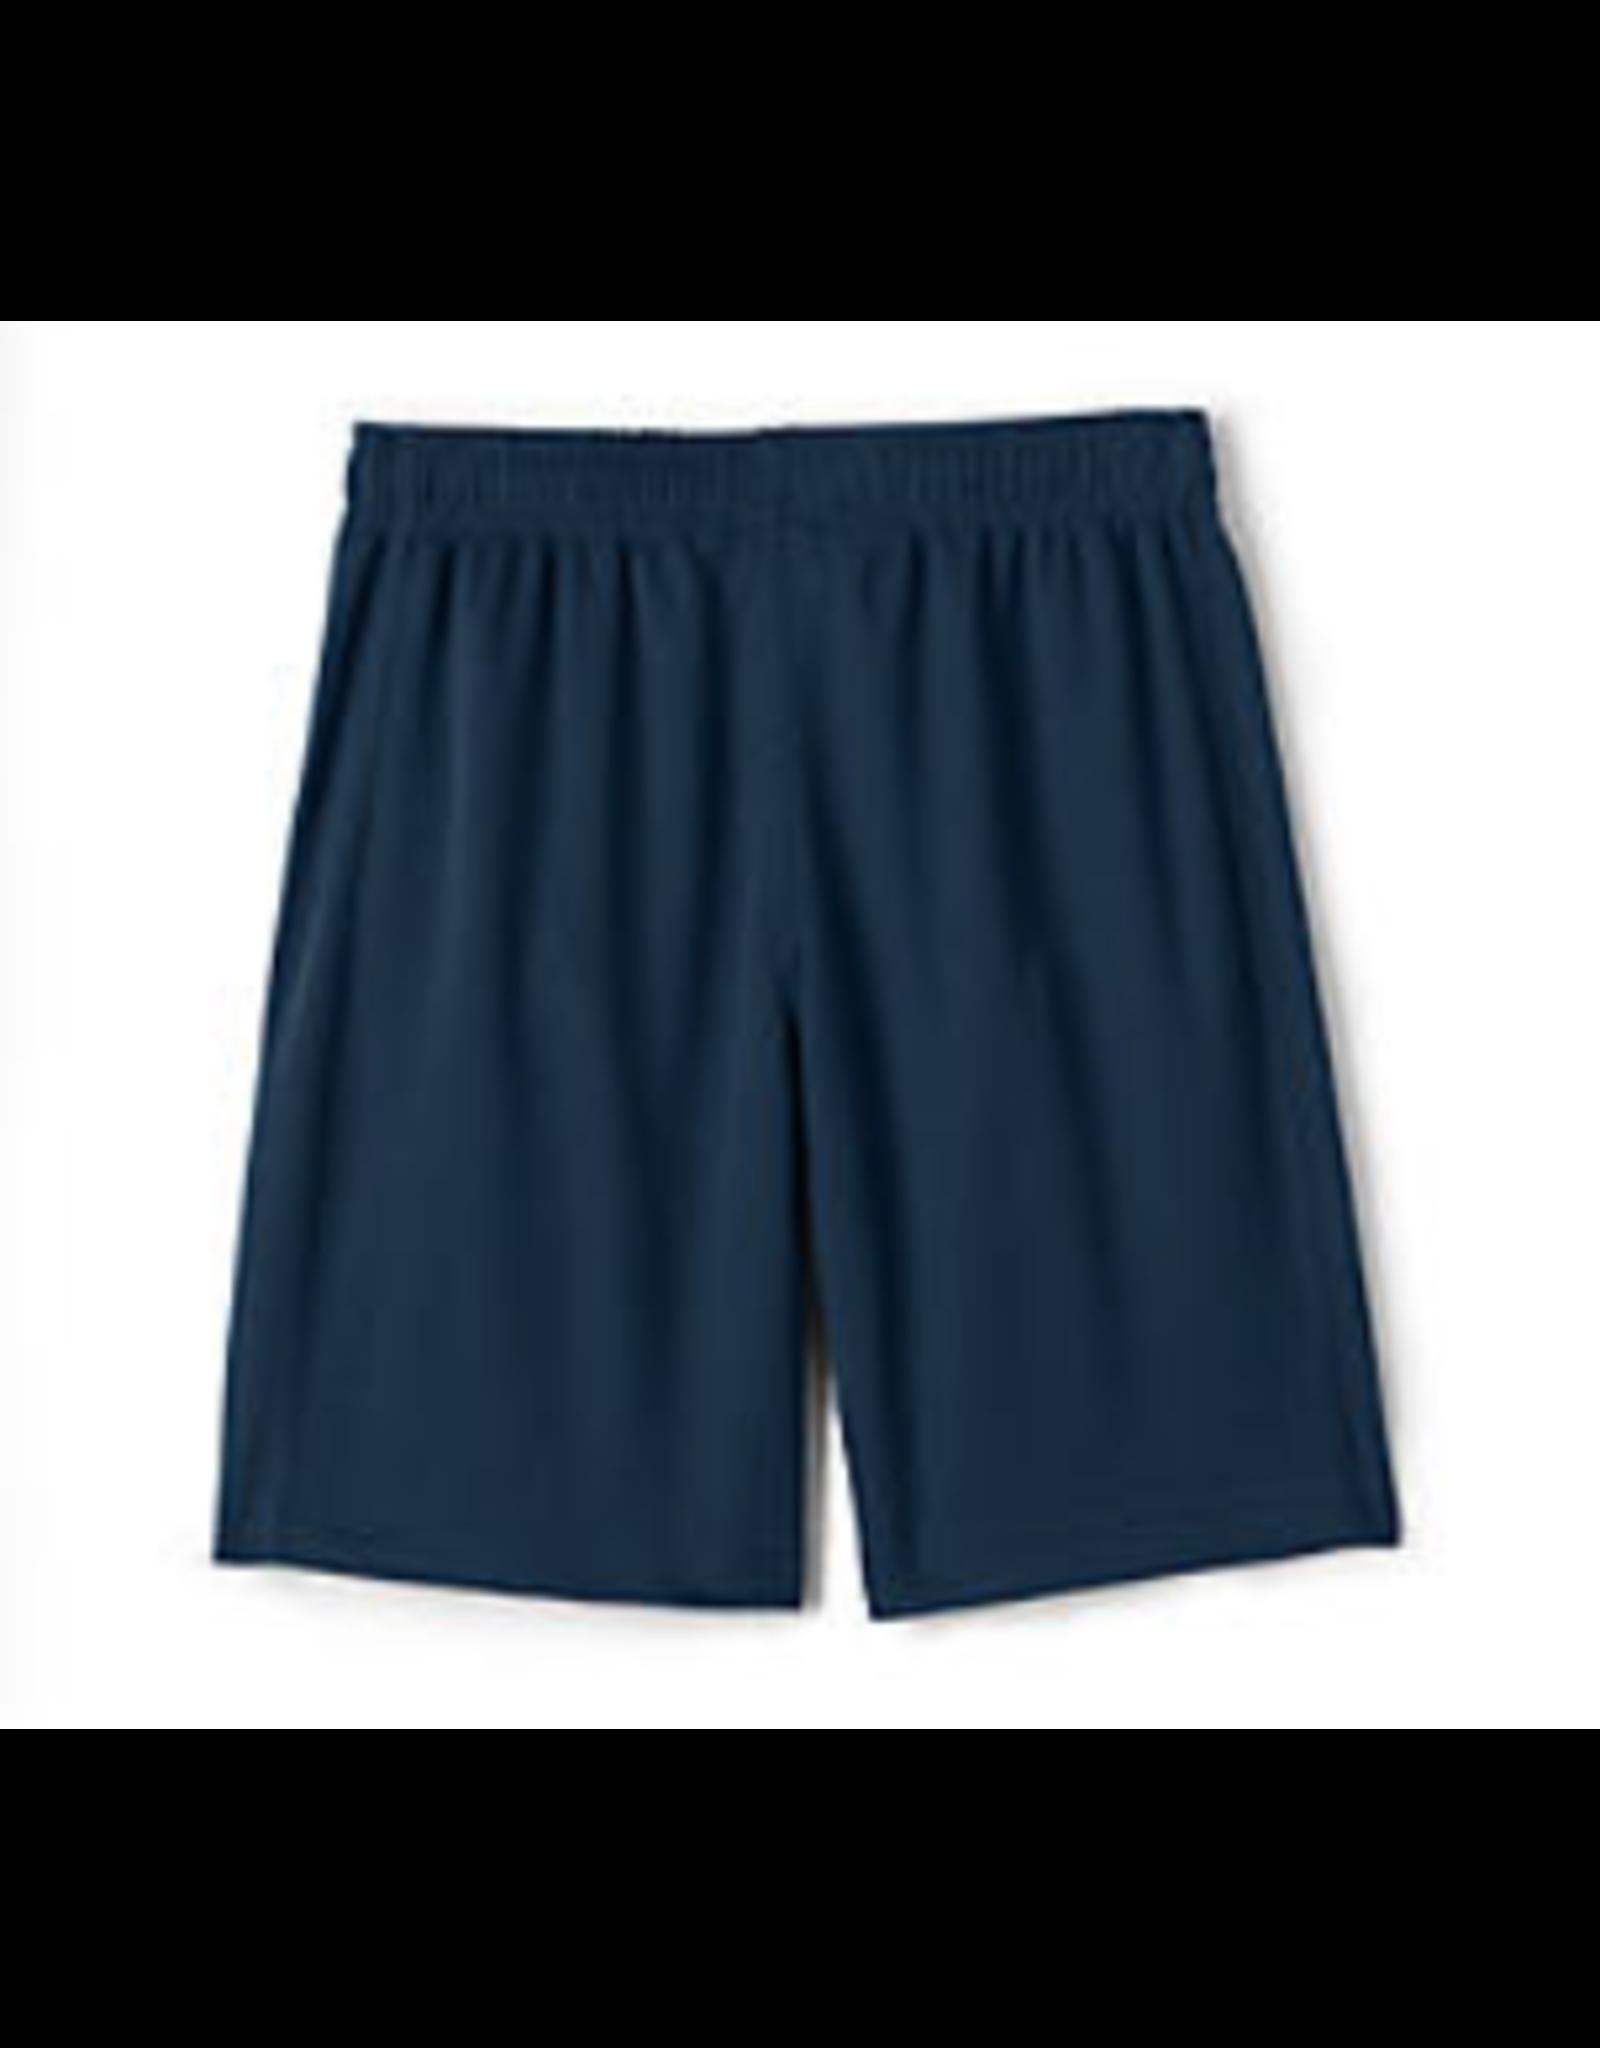 UNIFORM JD Gym Shorts